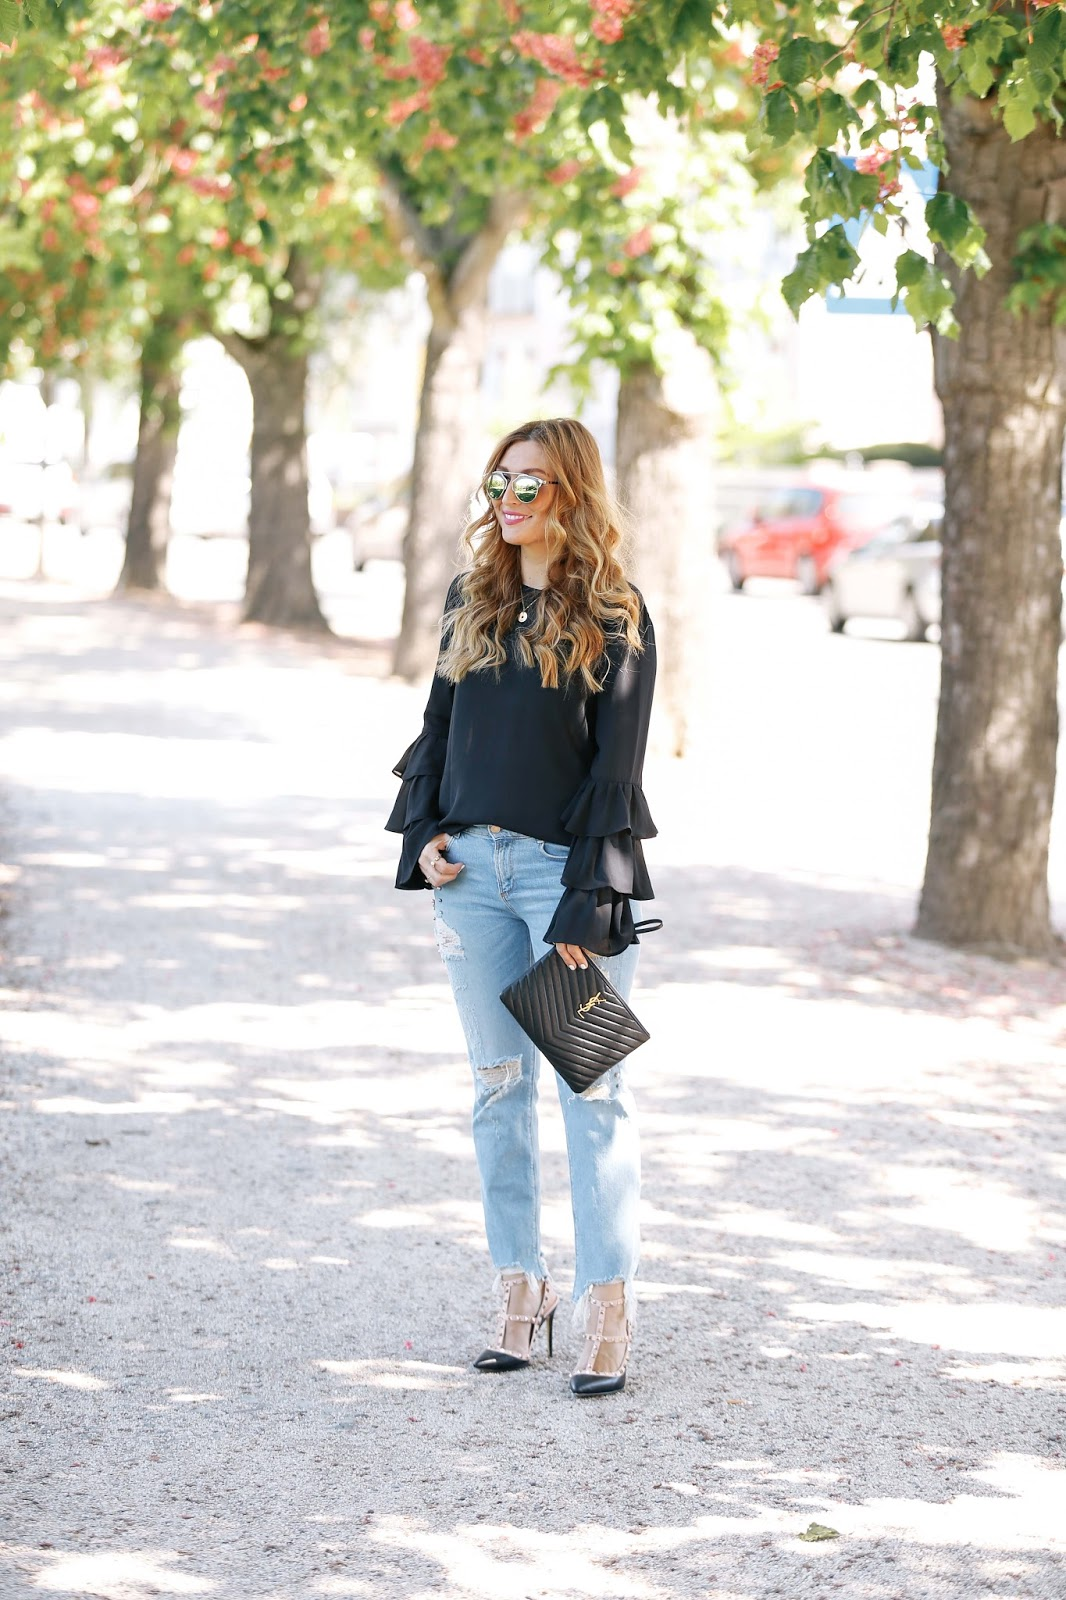 dior-sonnenbrille-blogger-ausfrankfurt-blogger-aus-deutschland-off-shoulder-bluse-frühlingslook-was-trägt-man-im-sommer-pinke-mules-fashionstylebyjohanna -lila-mules